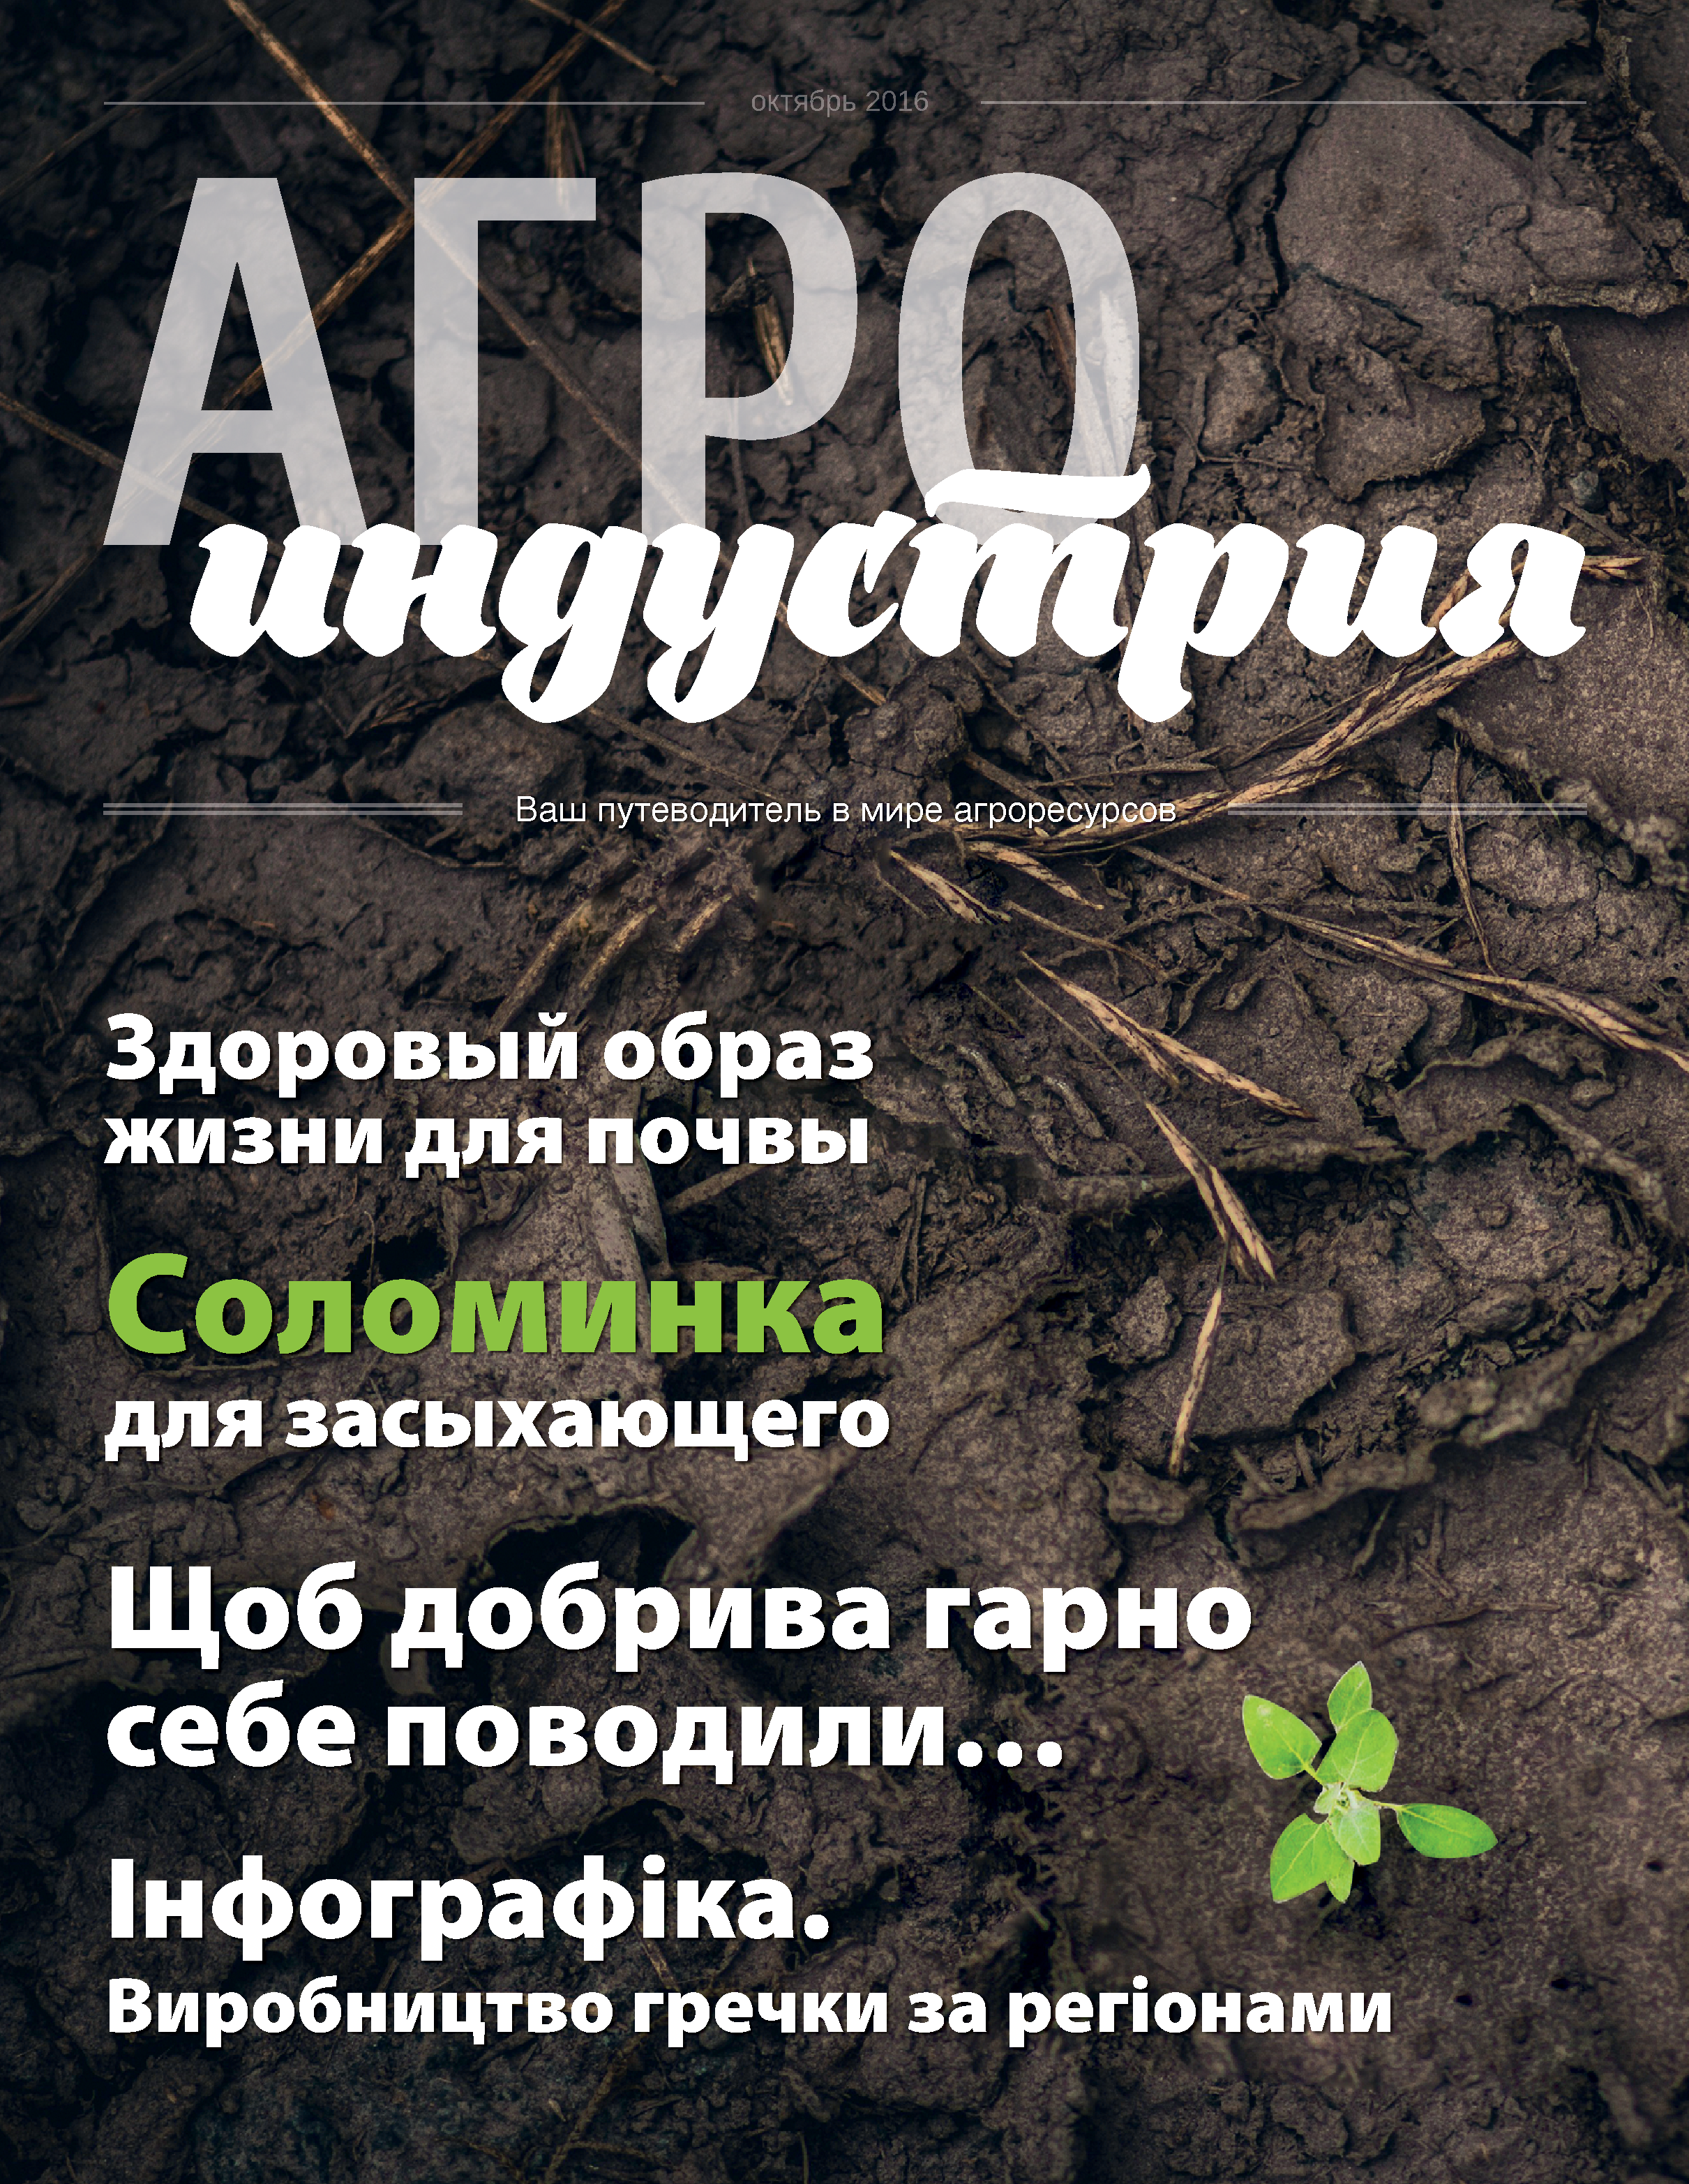 oblozhka-agroindoktyabr